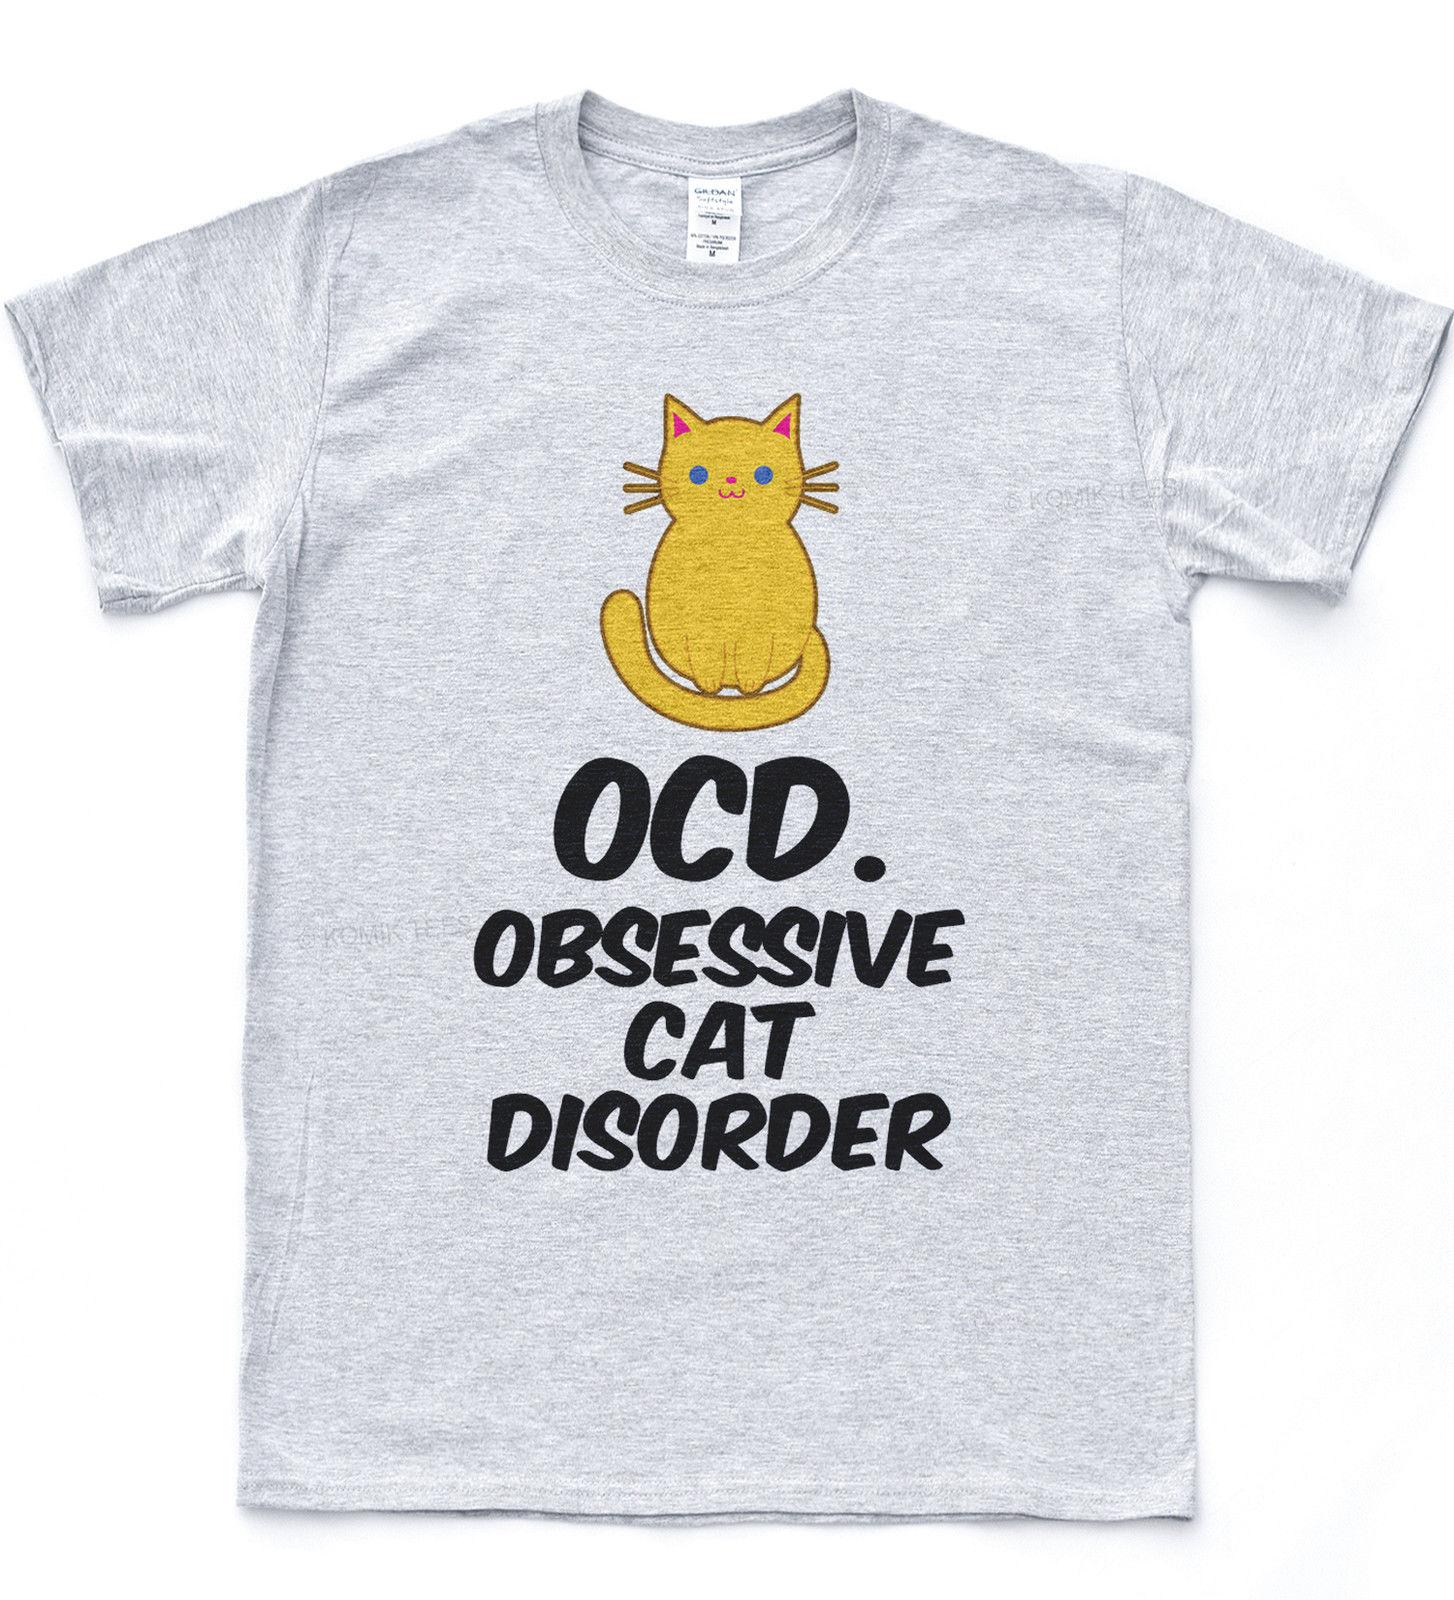 Trastorno obsesivo-compulsivo obsesivo gato trastorno camiseta felina Hipster estilo Miau gato superior